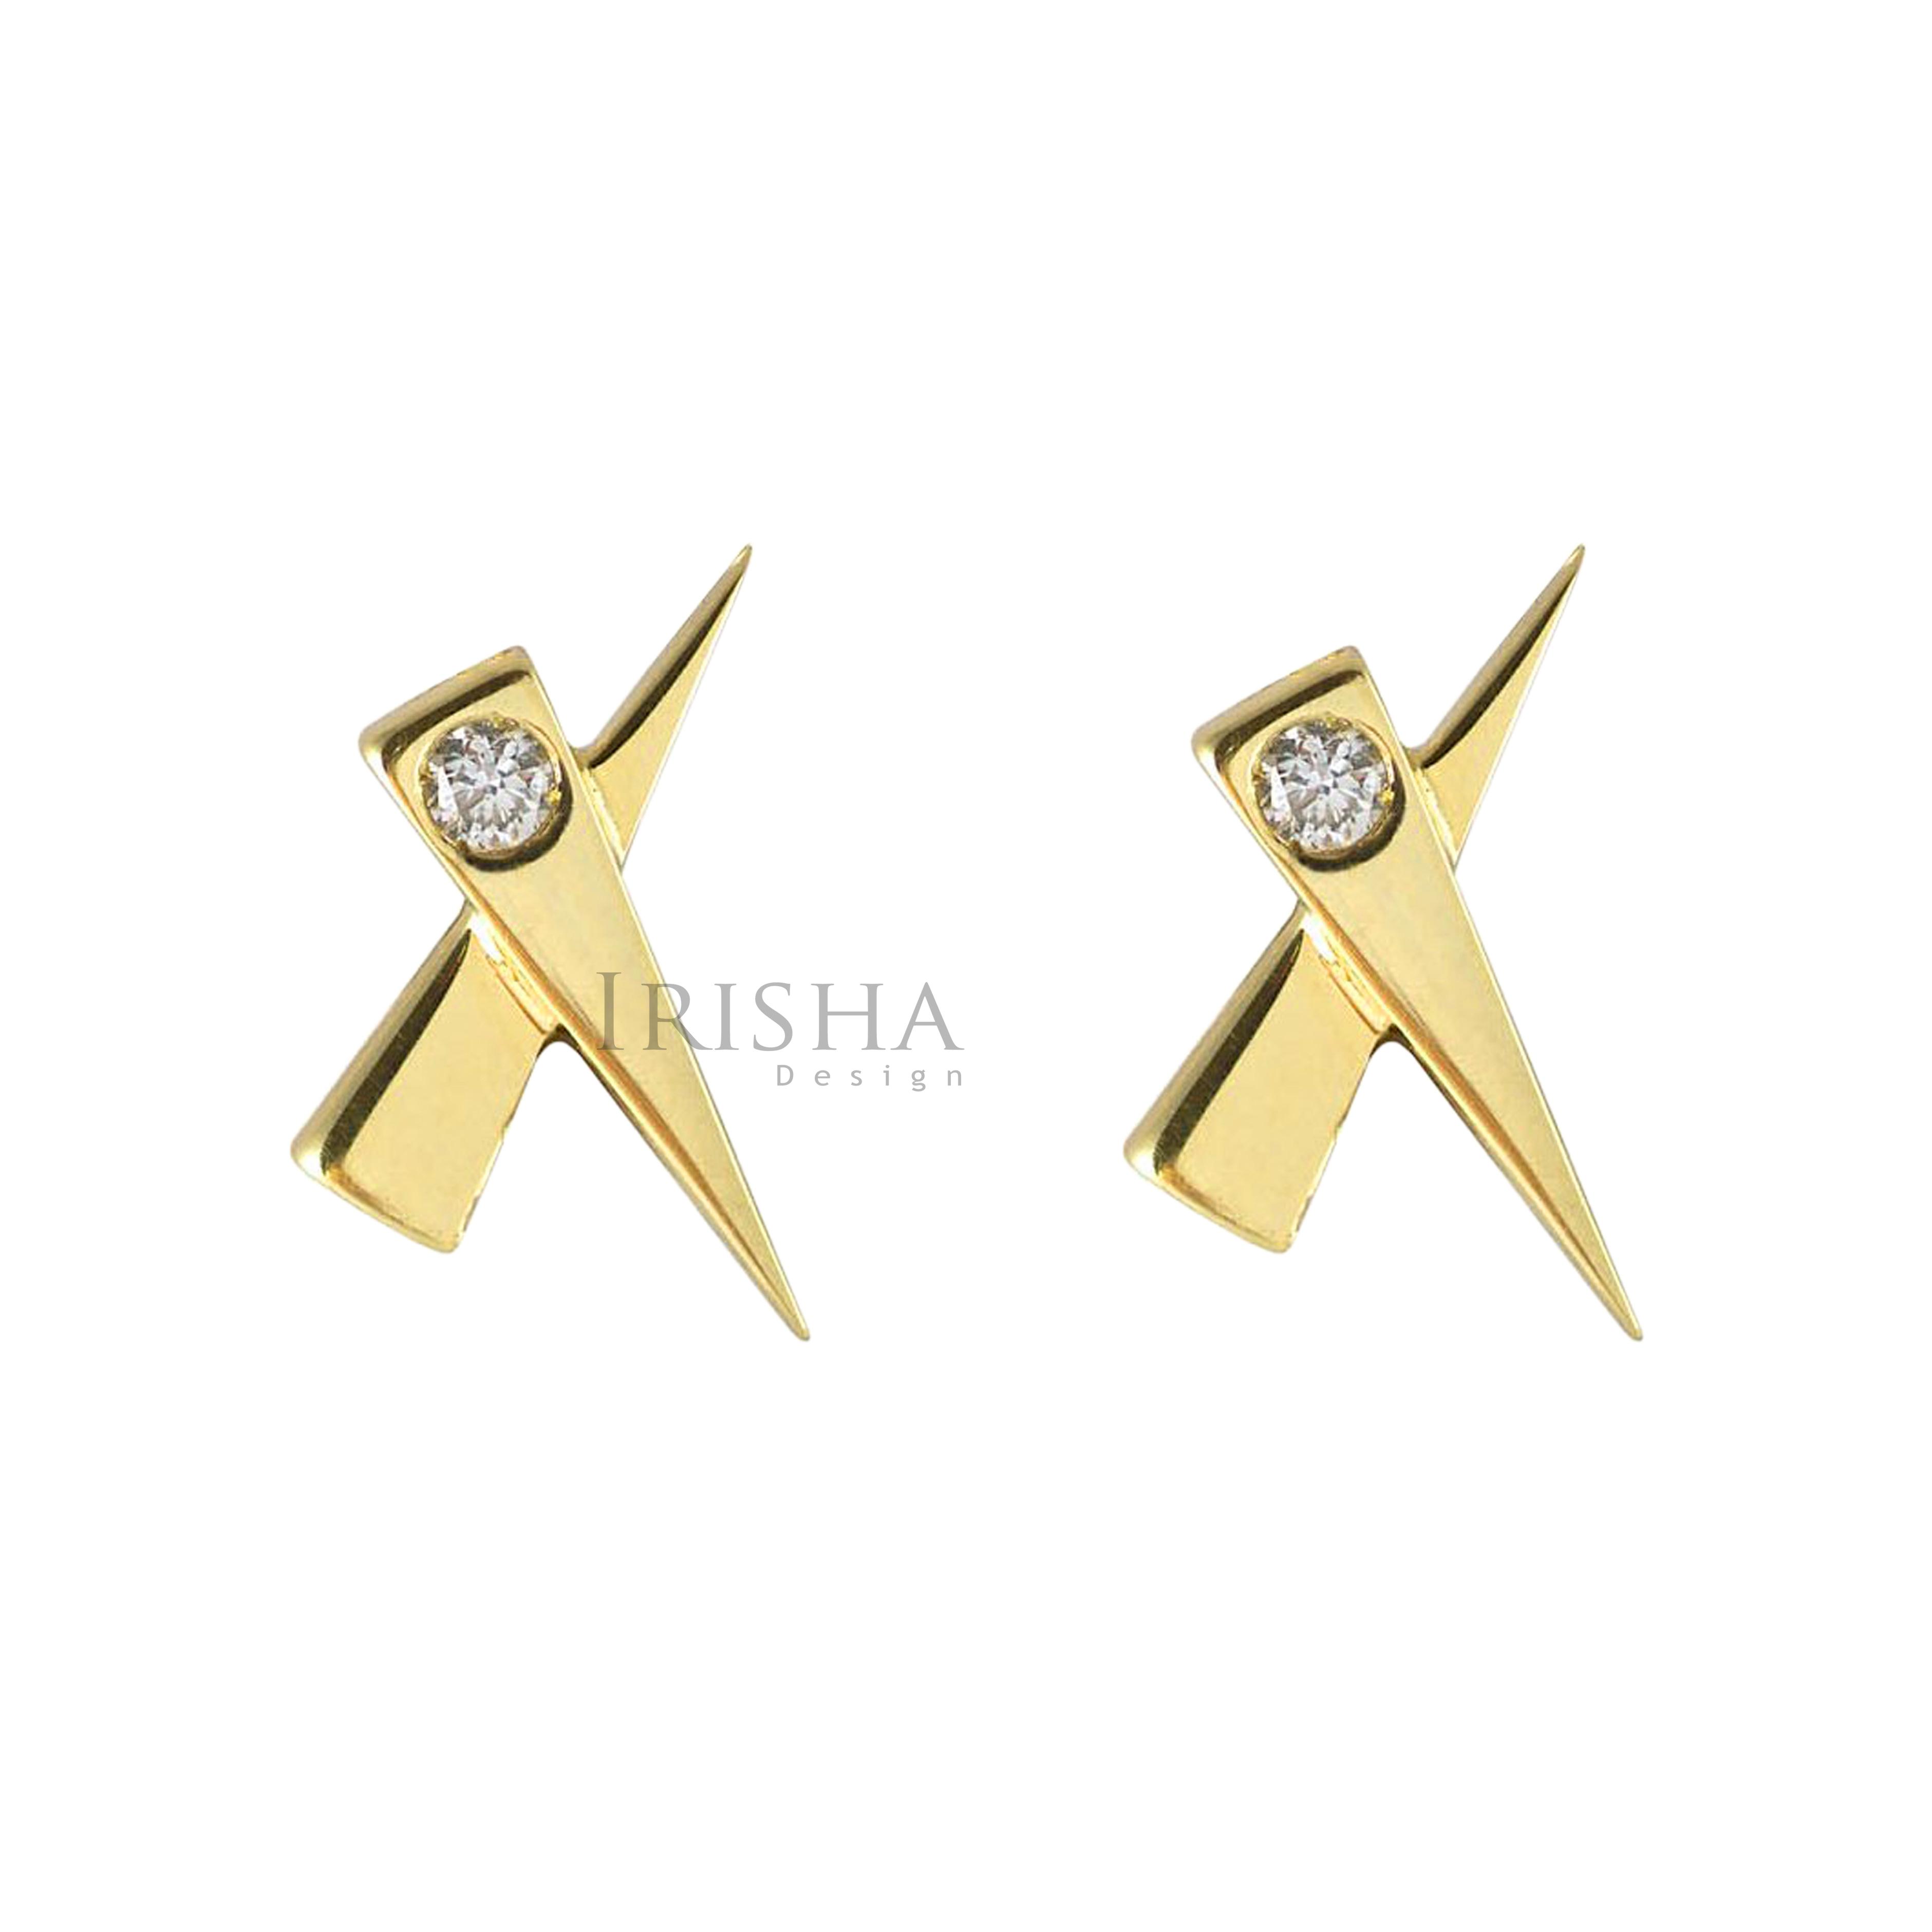 14K Gold 0.04 Ct. Genuine Diamond Kiss Studs Earrings Fine Jewelry - New Arrival